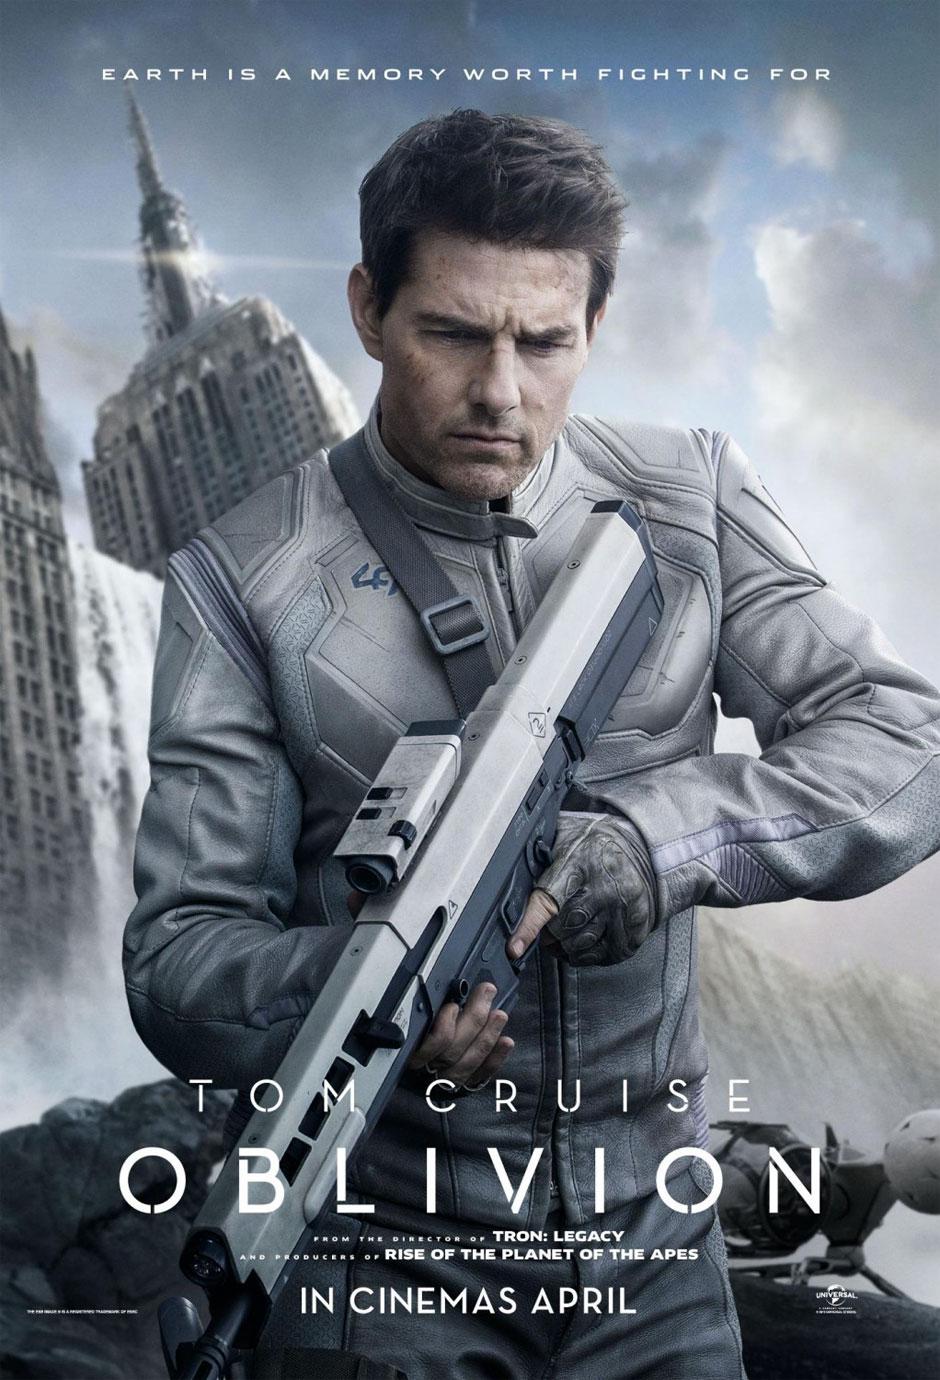 Watch Oblivion (2013) Hindi Dubbed Movie Online Free on Viooz